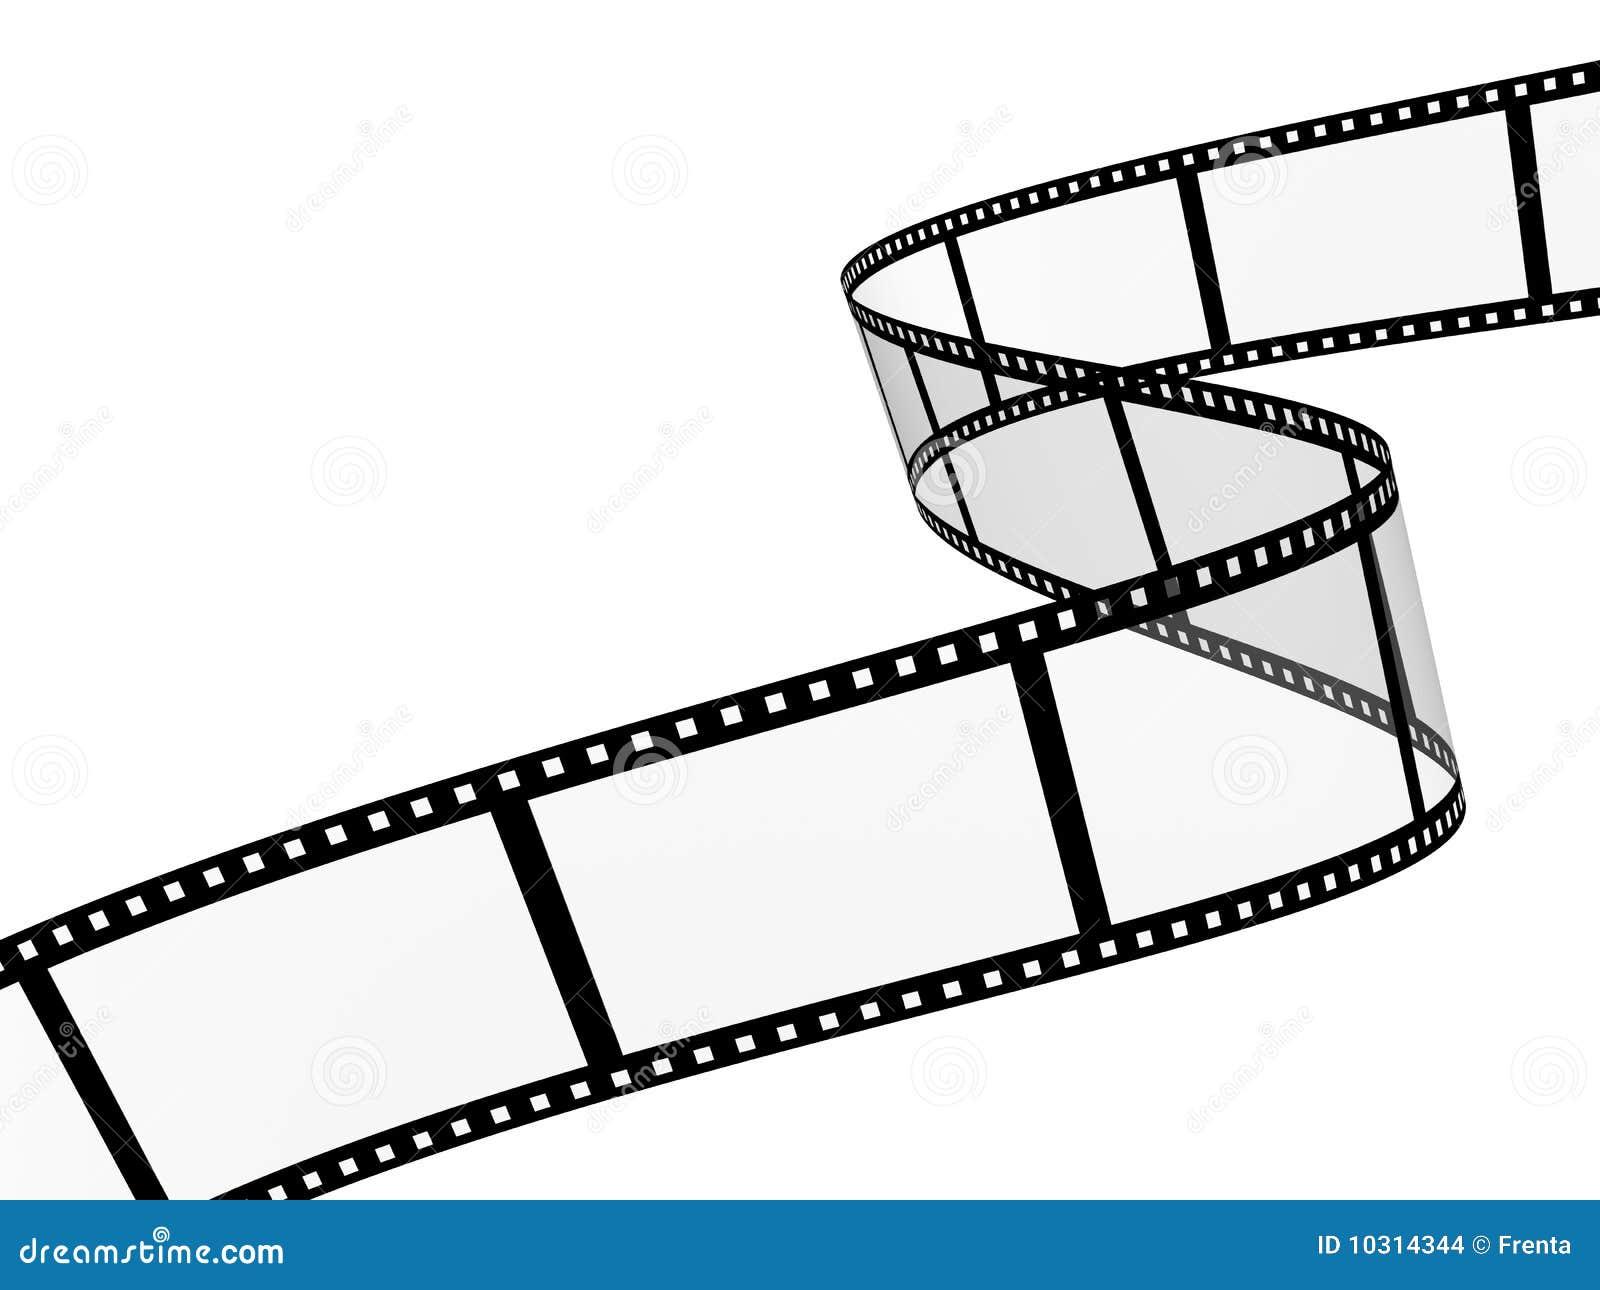 clipart pellicola cinematografica - photo #24